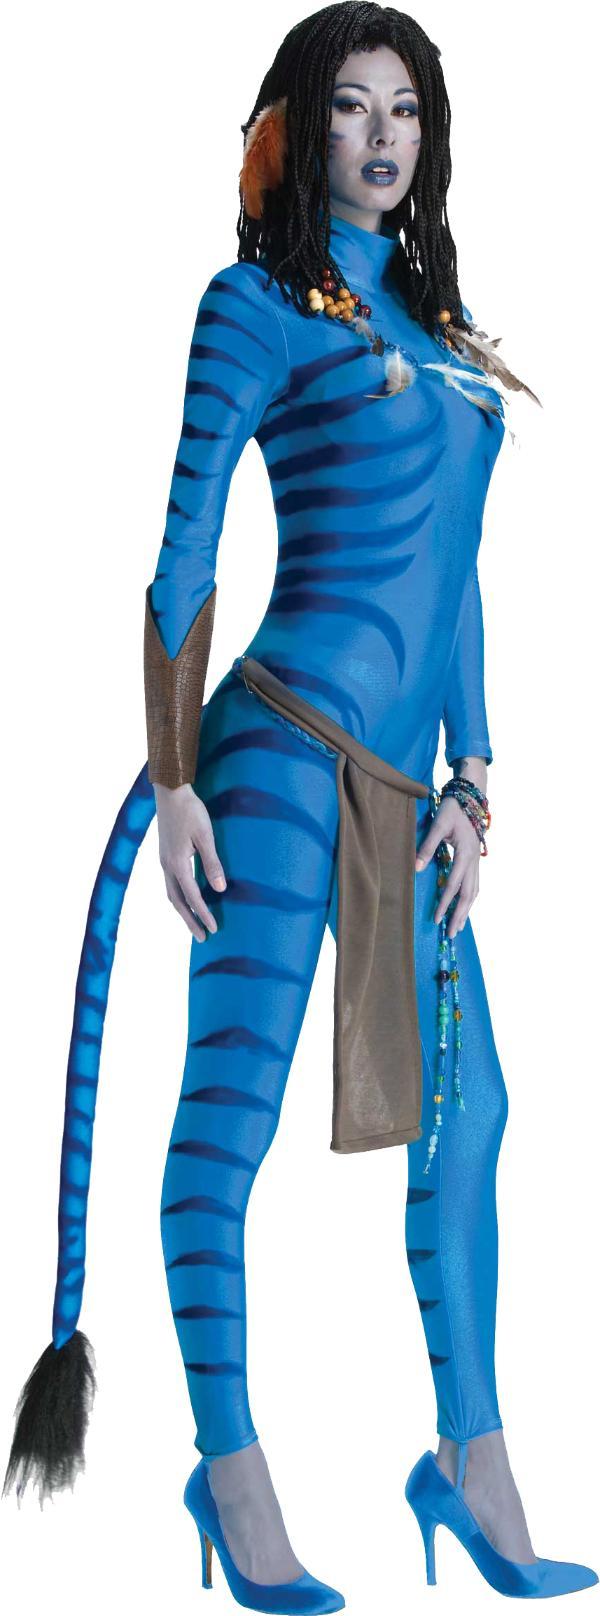 Deguisement-Avatar-Neytiri-femme-Cod-174140